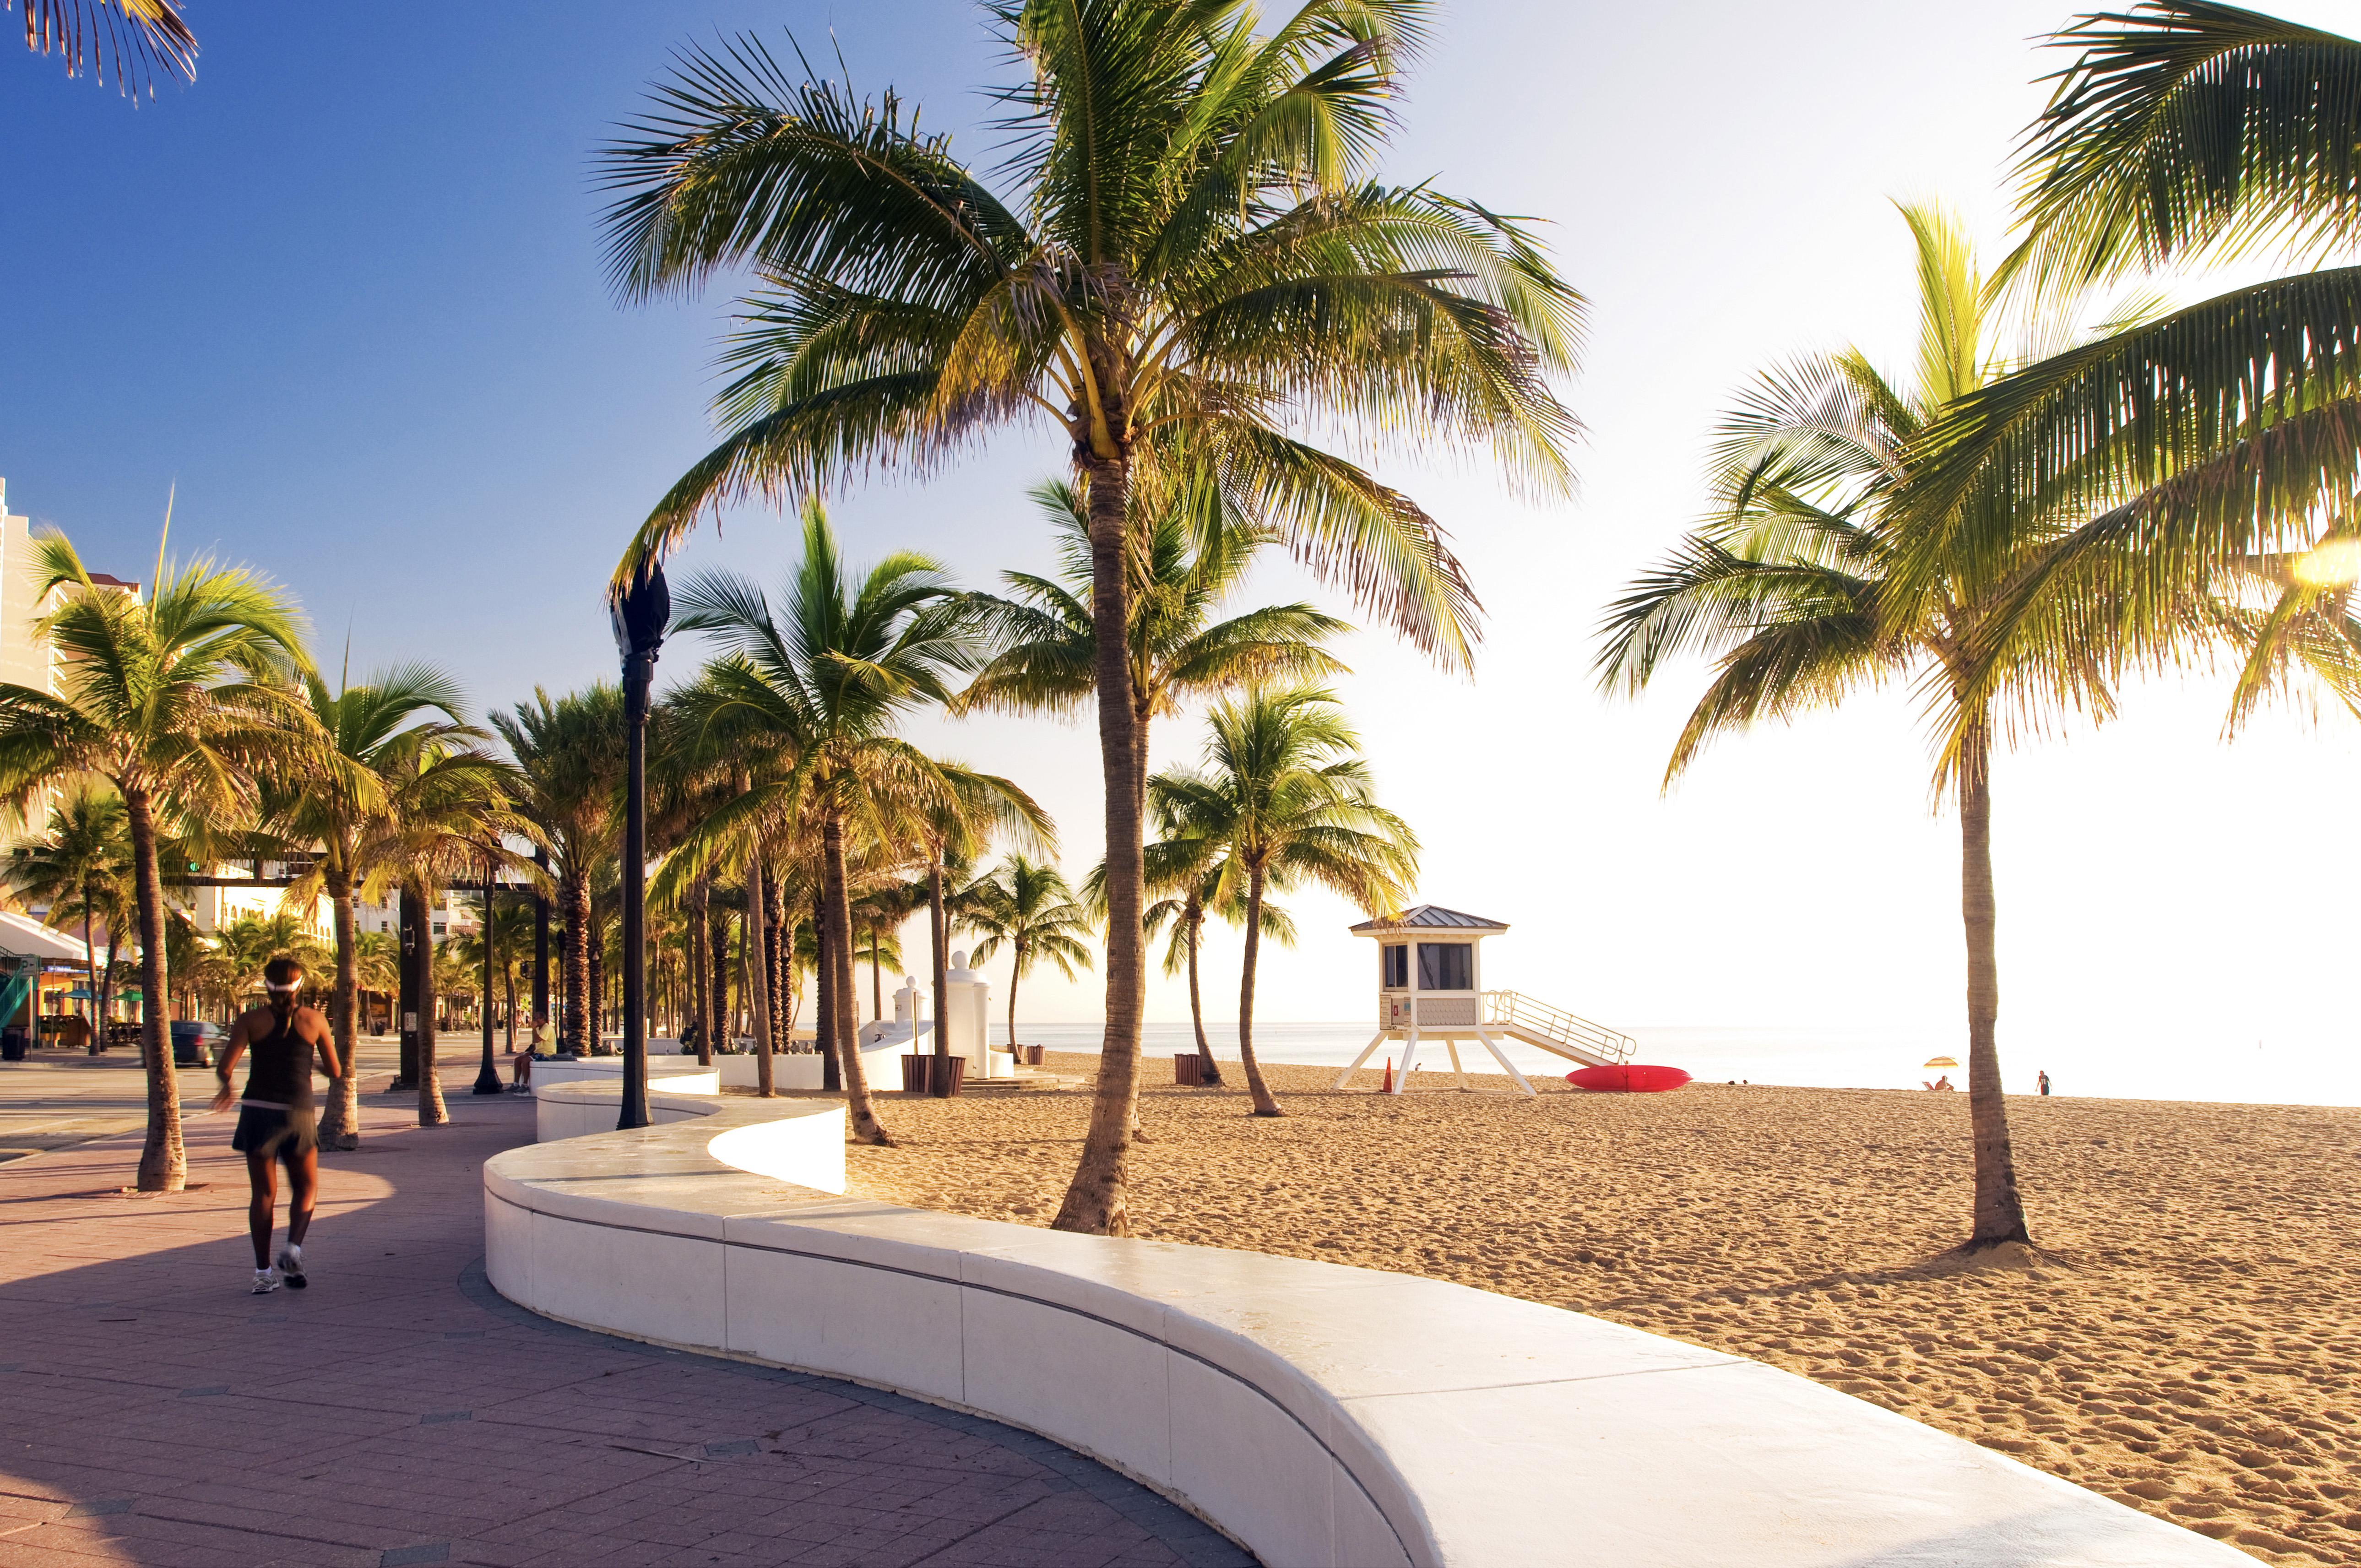 Beach, Fort Lauderdale, Florida, USA